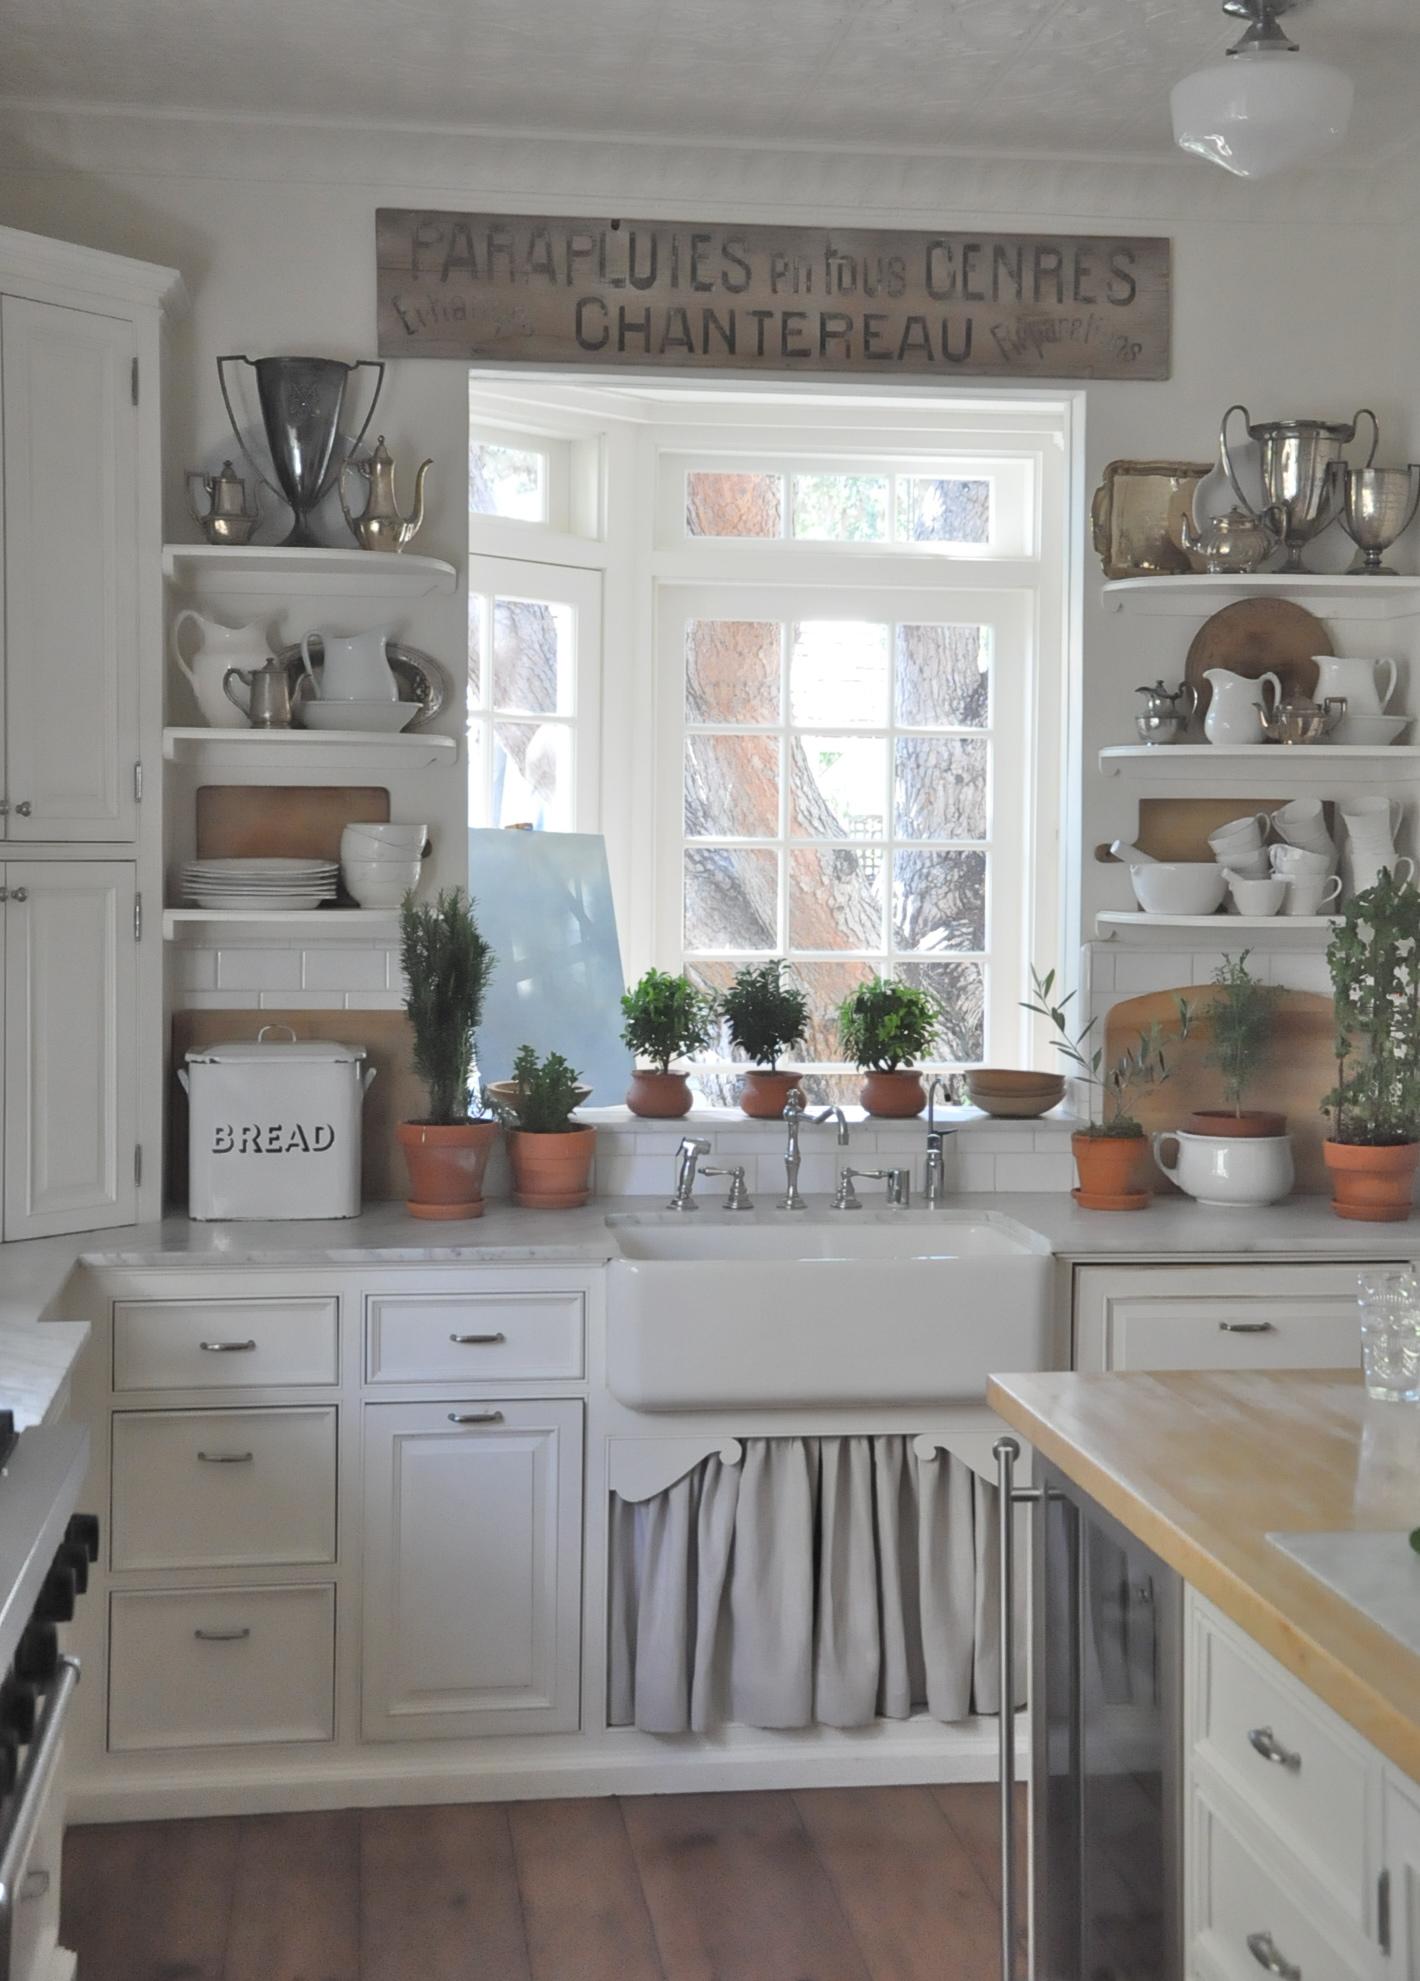 brocante keukenkasten : Brocante Keuken Het Keukengordijntje Bobbie S Home